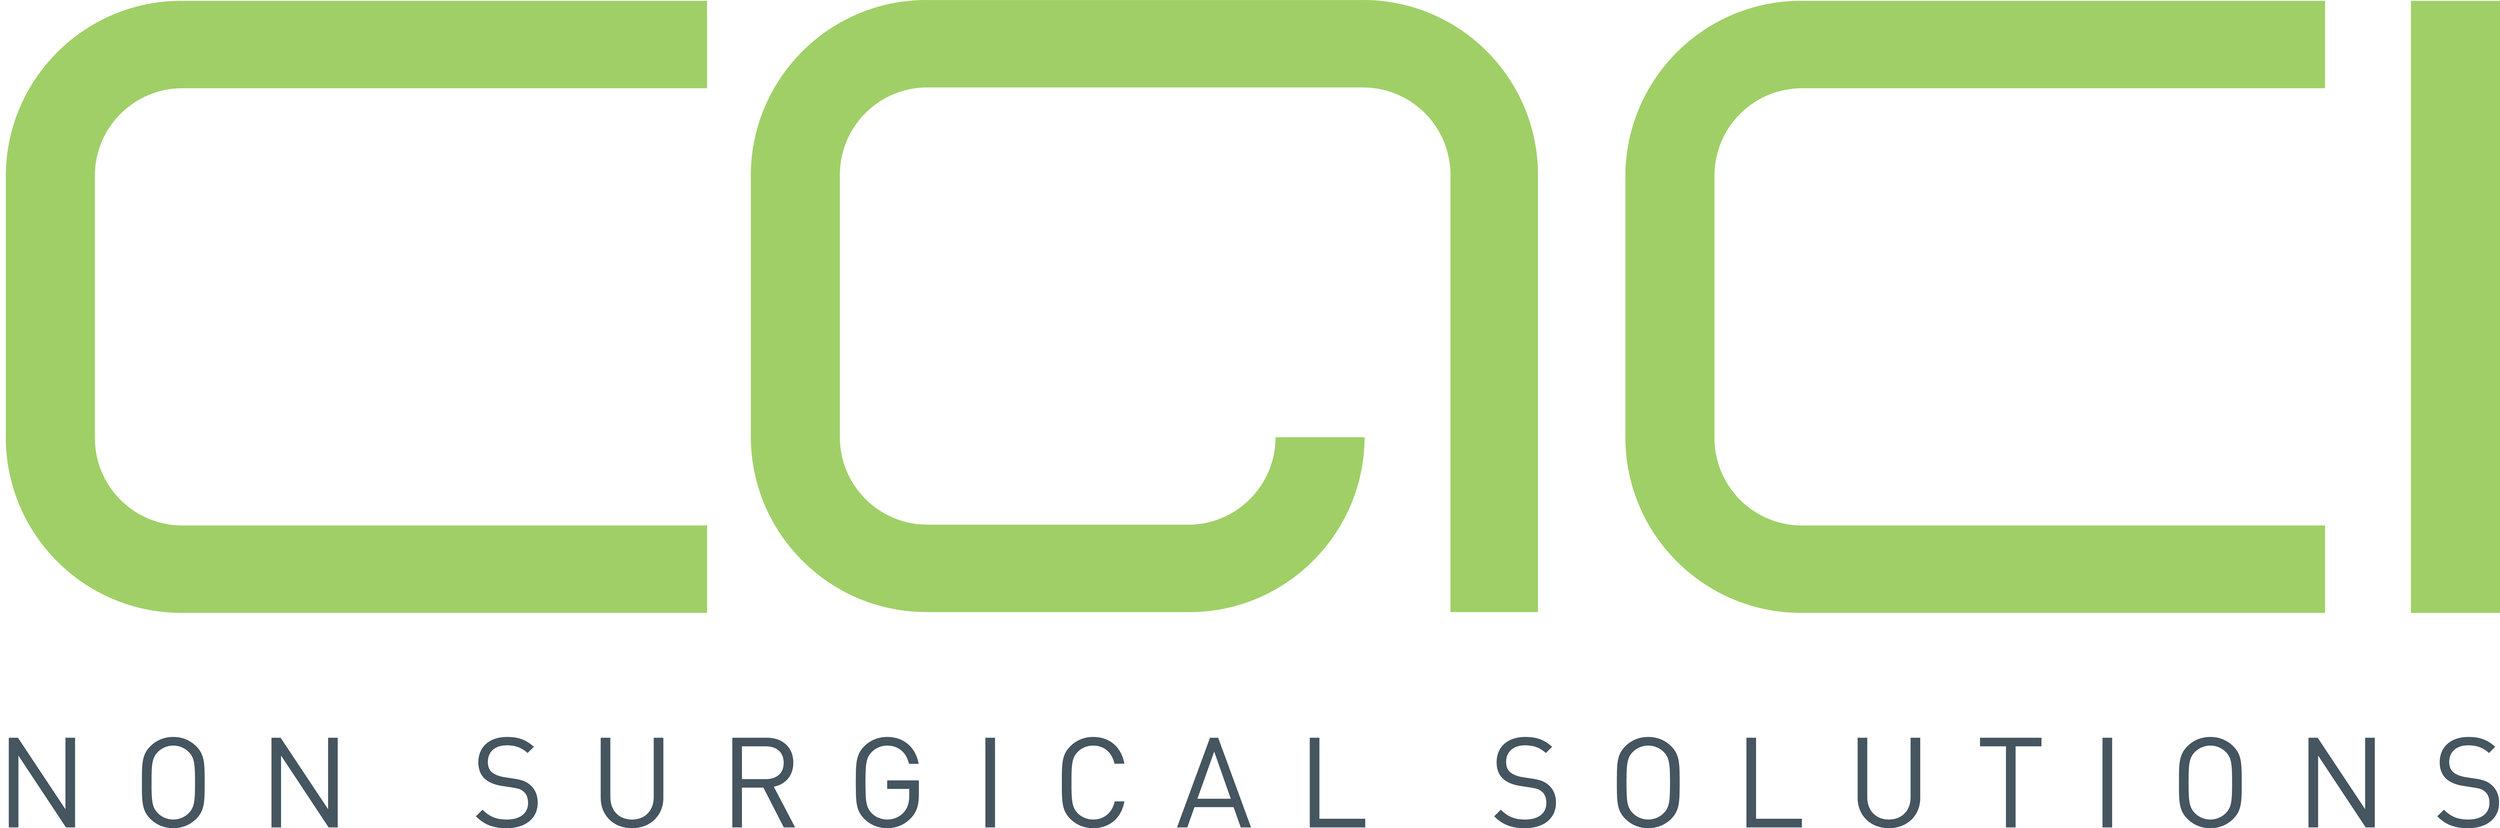 NEW_CACI_logo_NSS_RGB.jpg